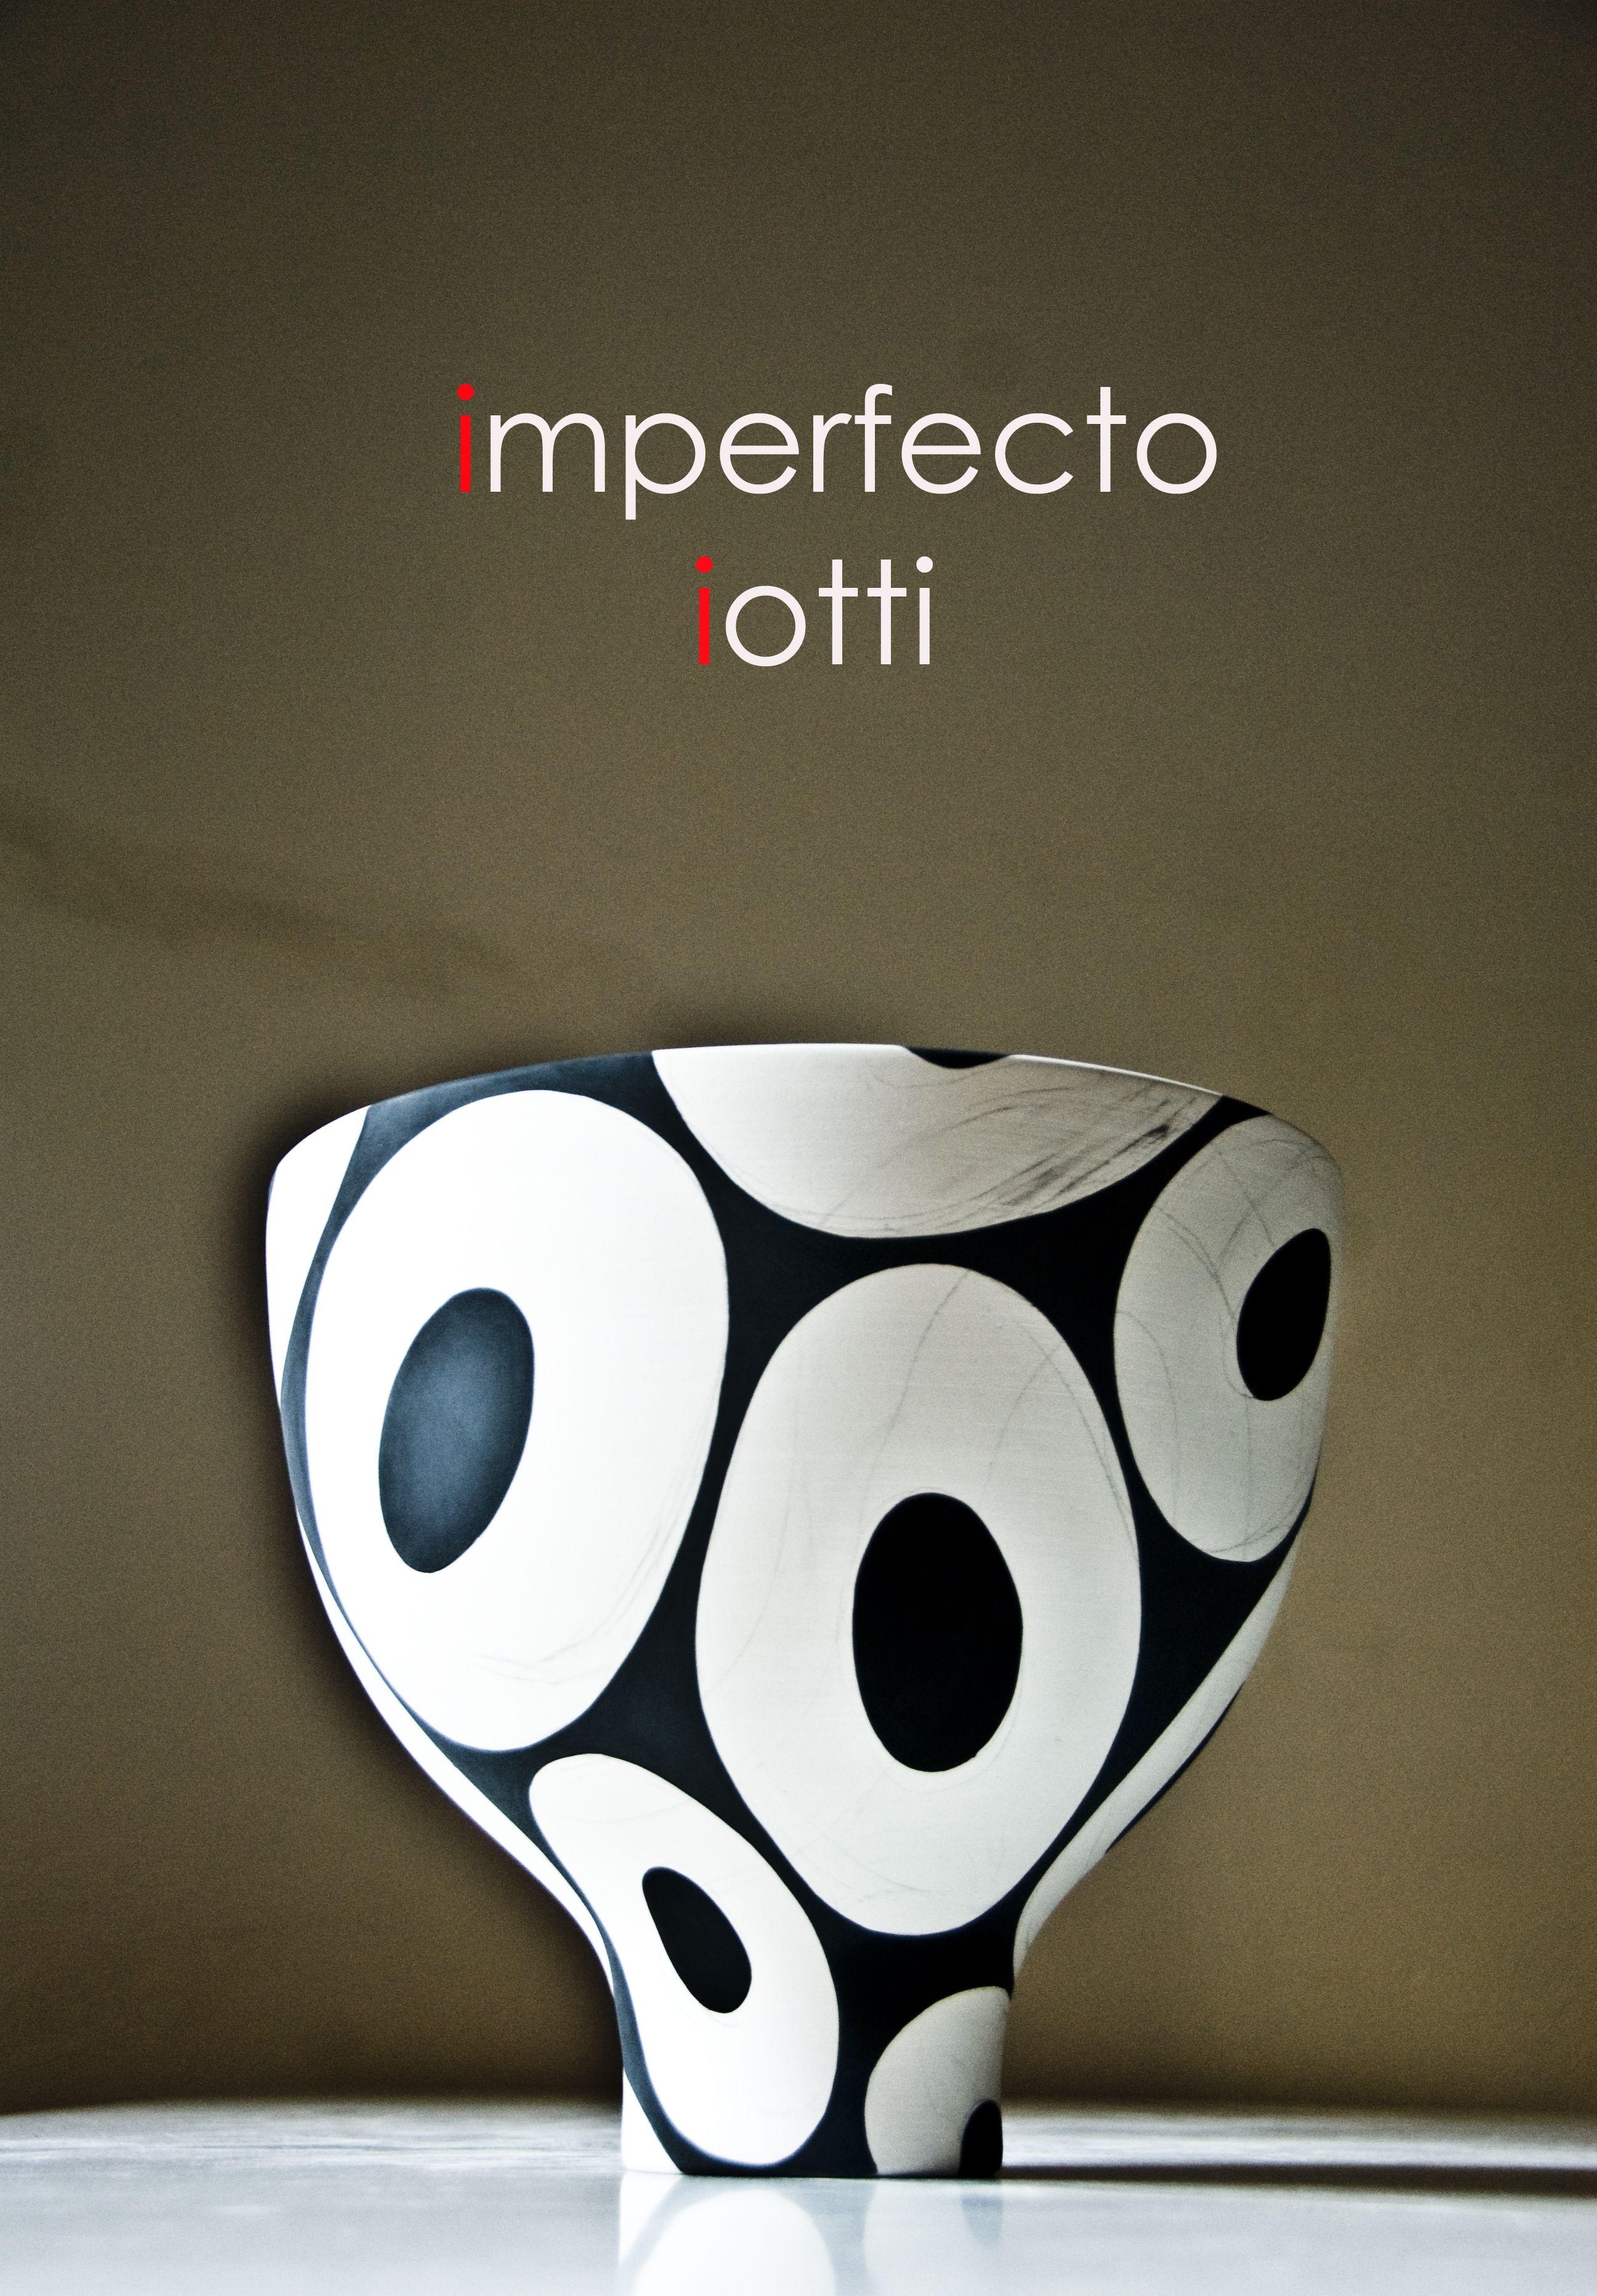 https://www.facebook.com/imperfecto.arte